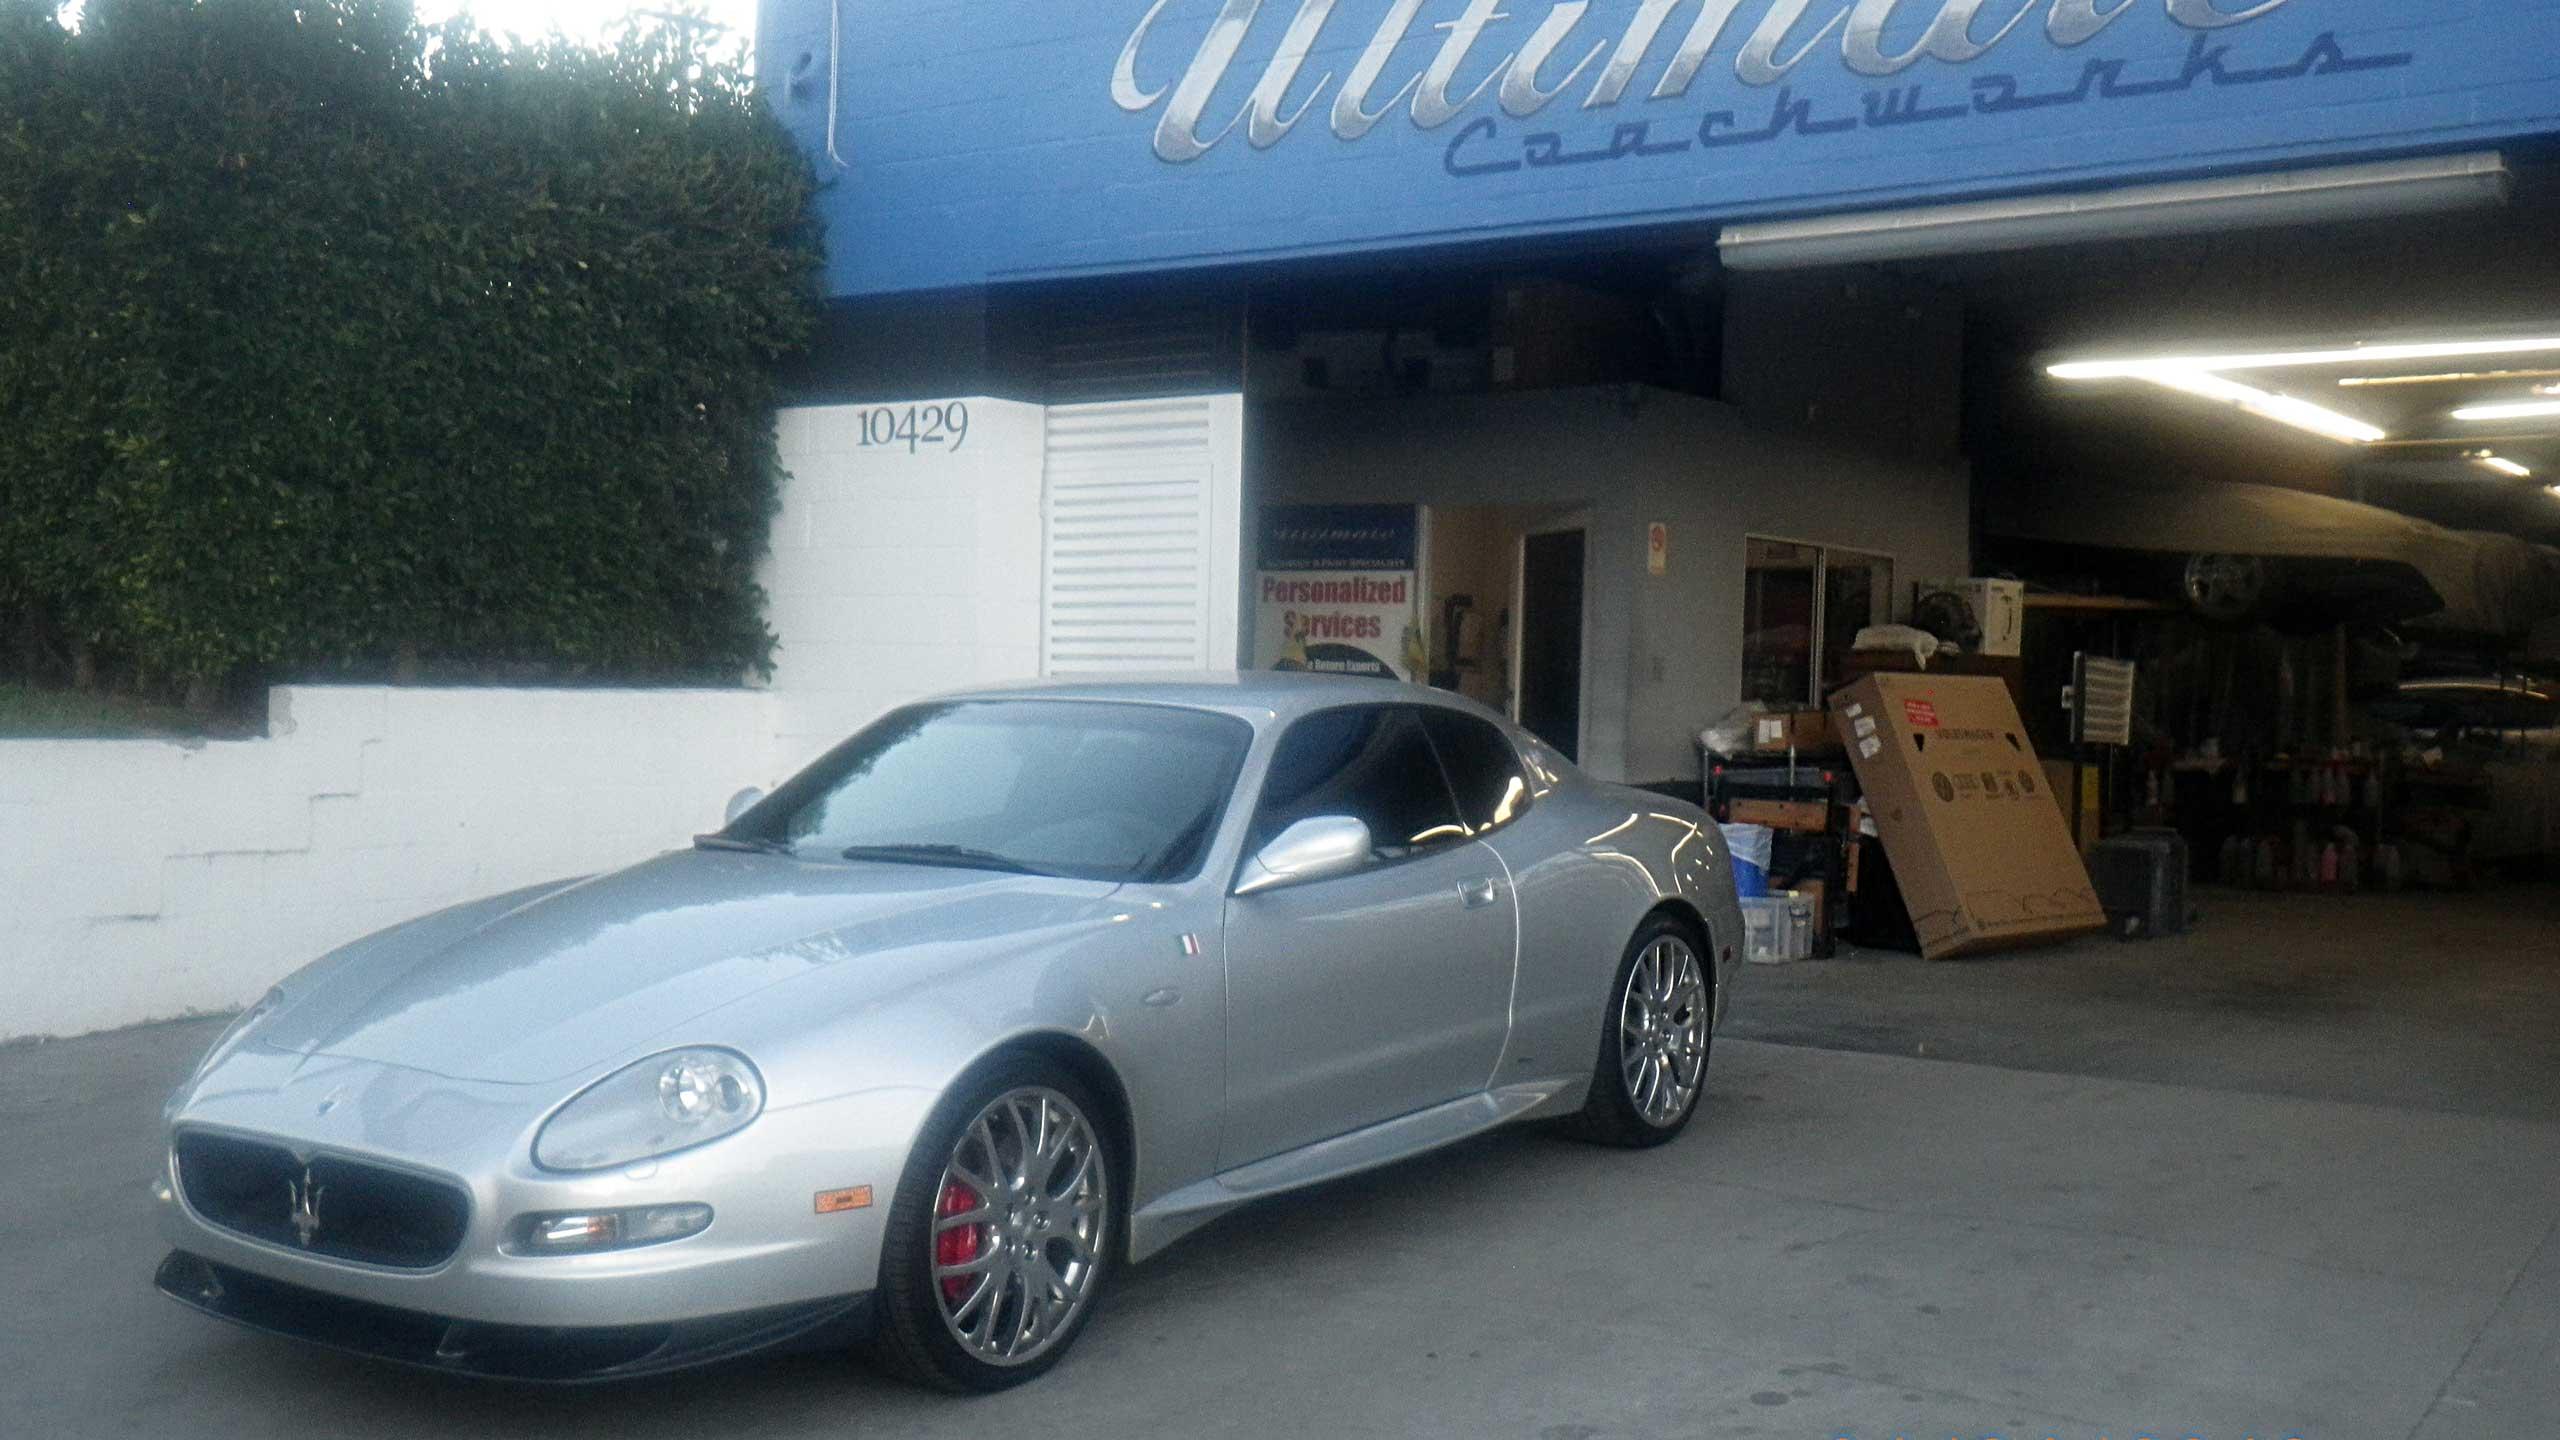 UC_1_car_side_storefront_2560x1440-011